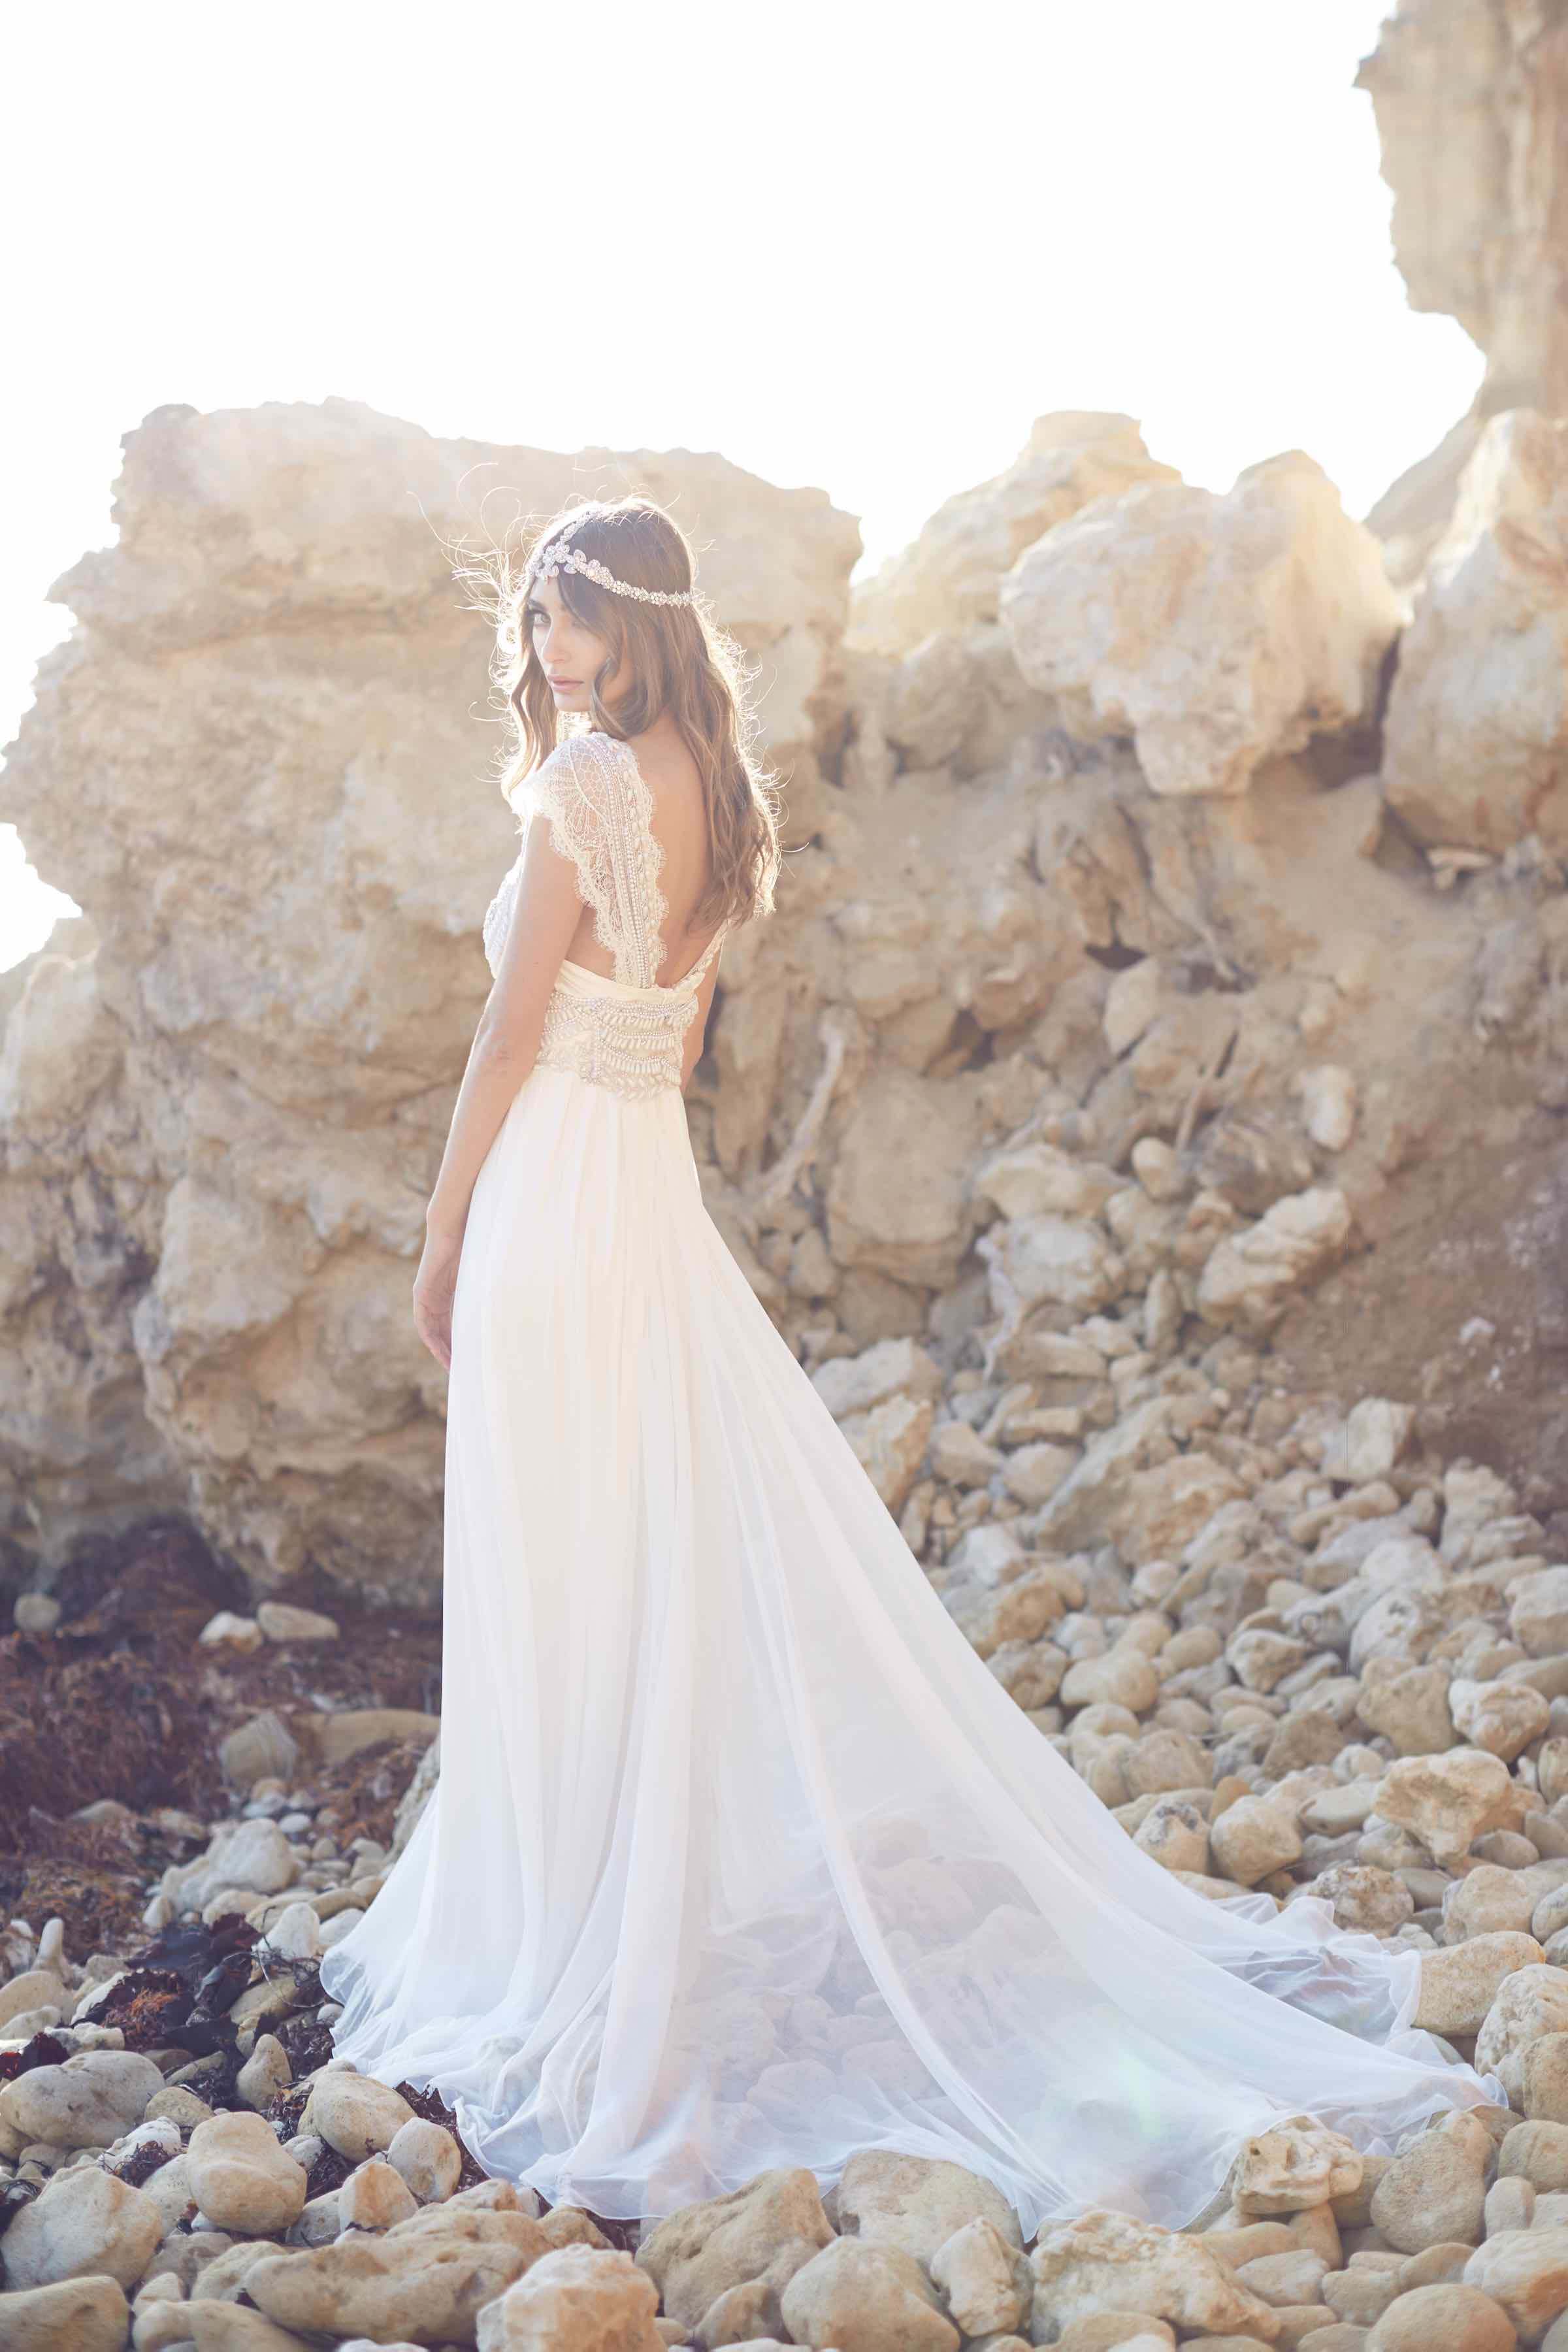 Anna Campbell Coco Dress | Vintage inspired embellished wedding dress